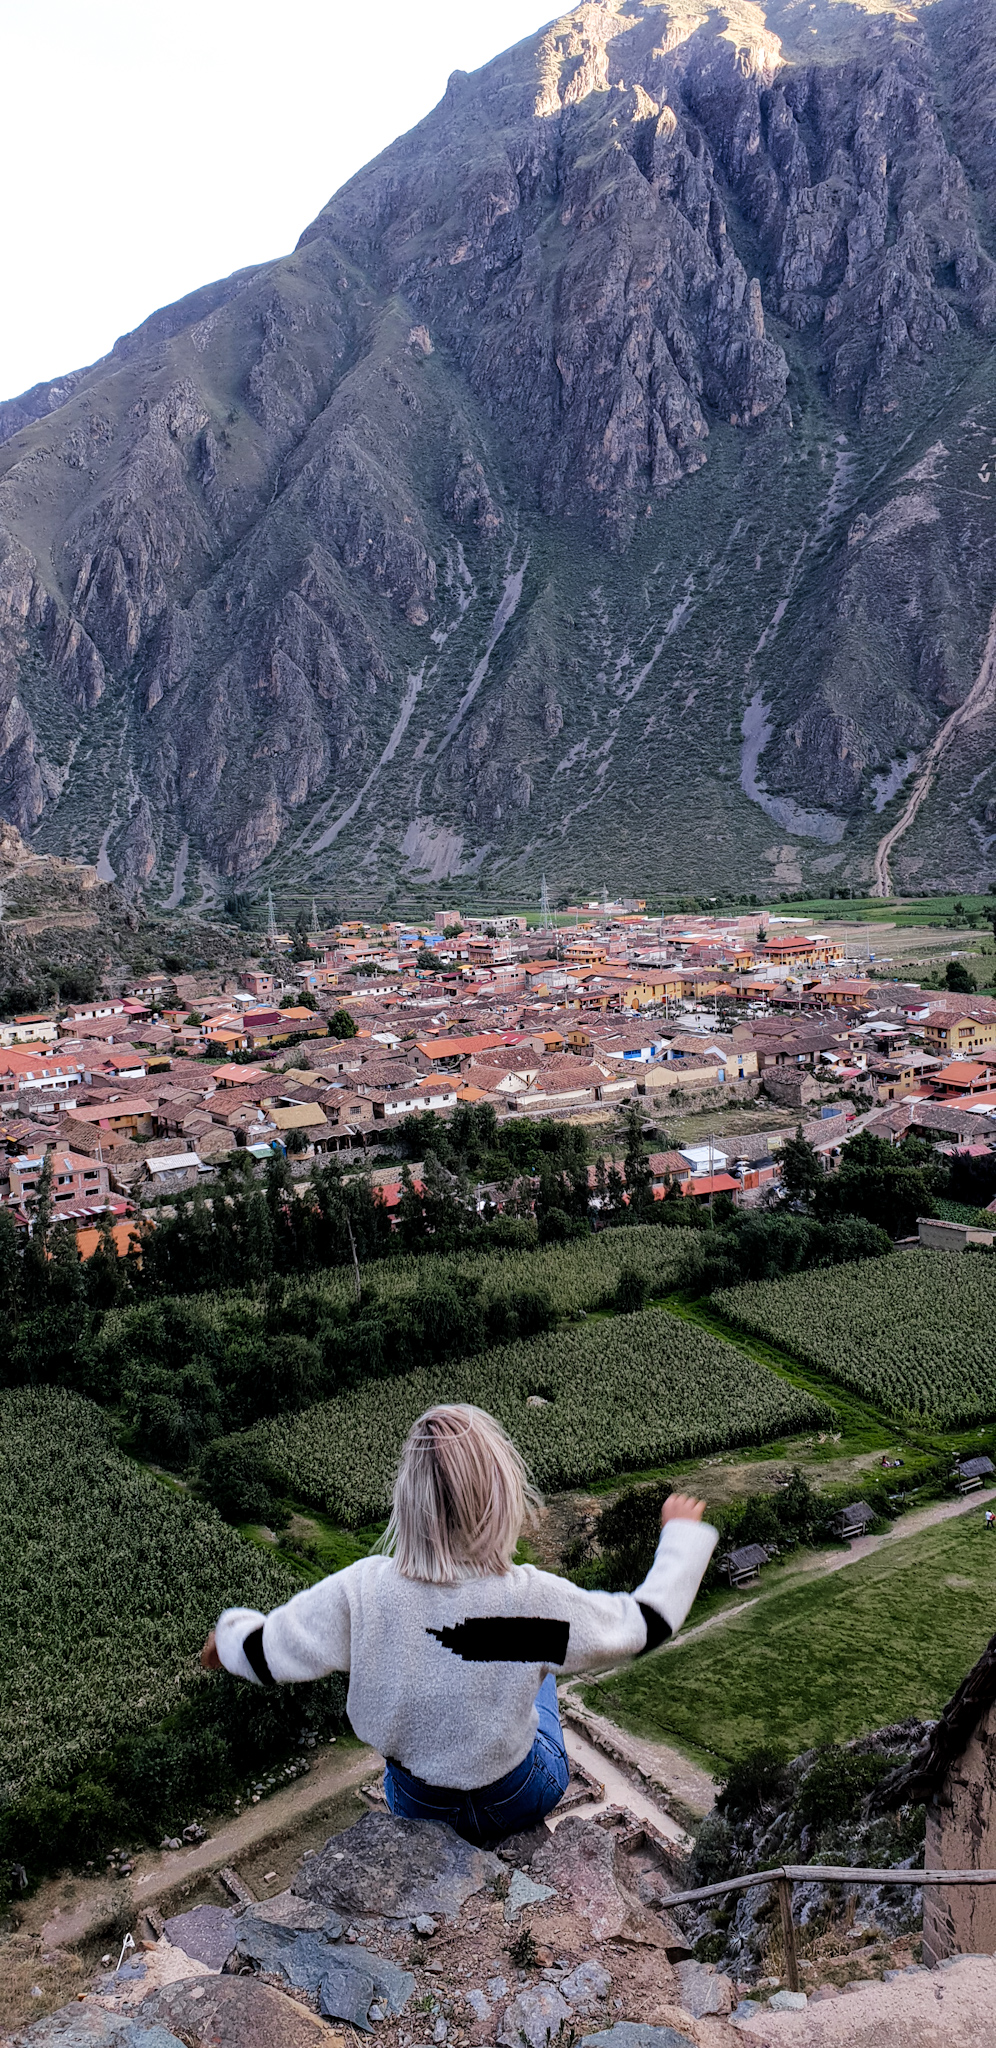 Ollataytambo SACRED VALLEY Peru